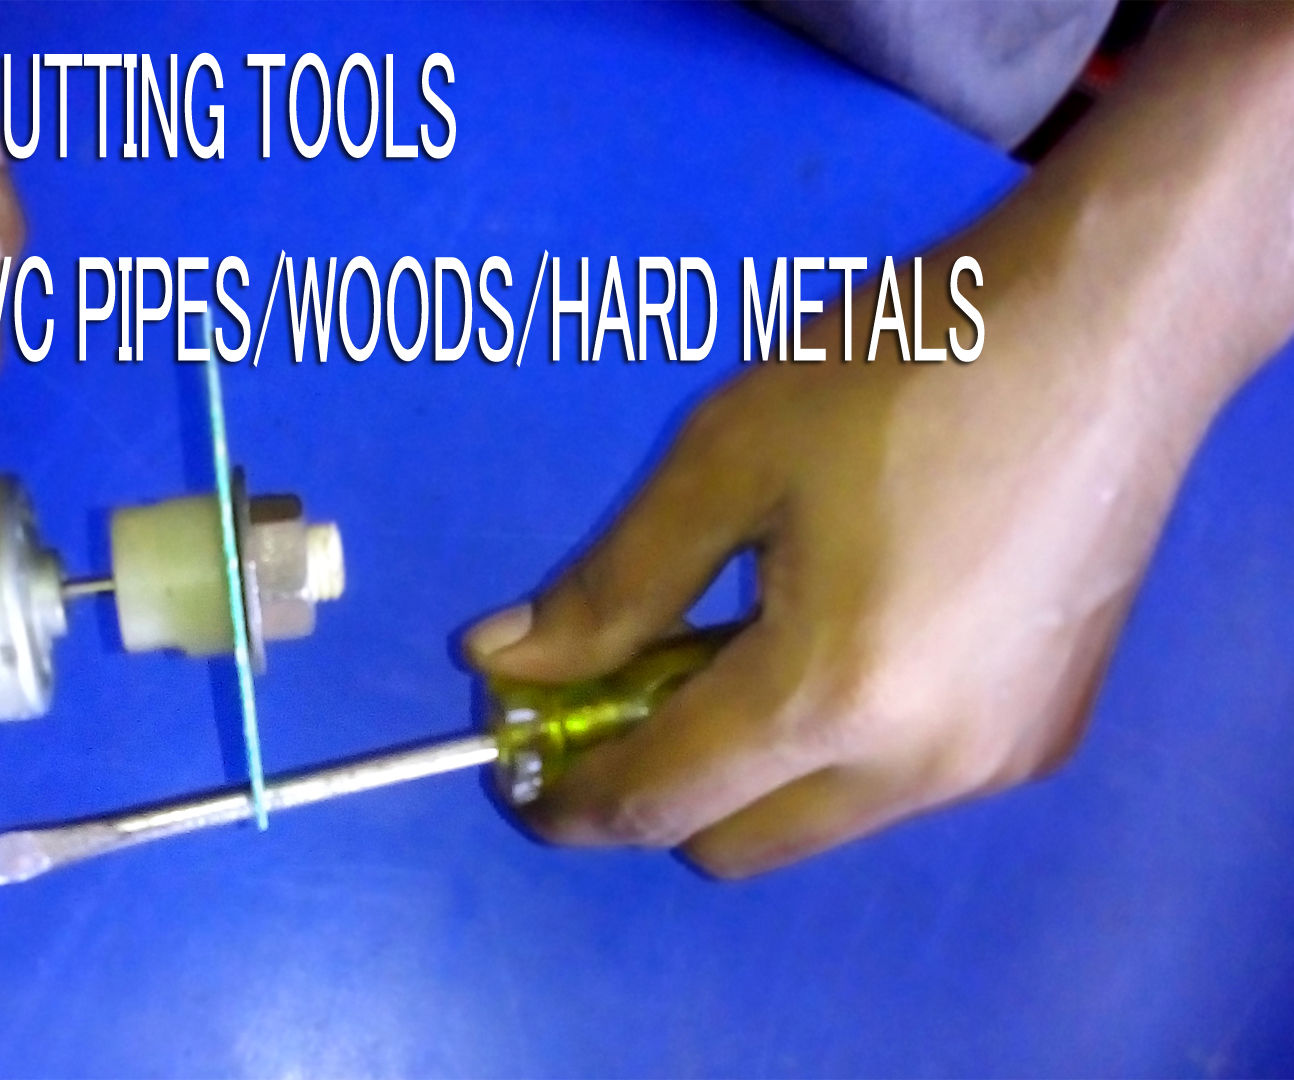 How to make original powerful DIY Homemade DREMEL Rotary tool cutting metal pvc pipes nails woods